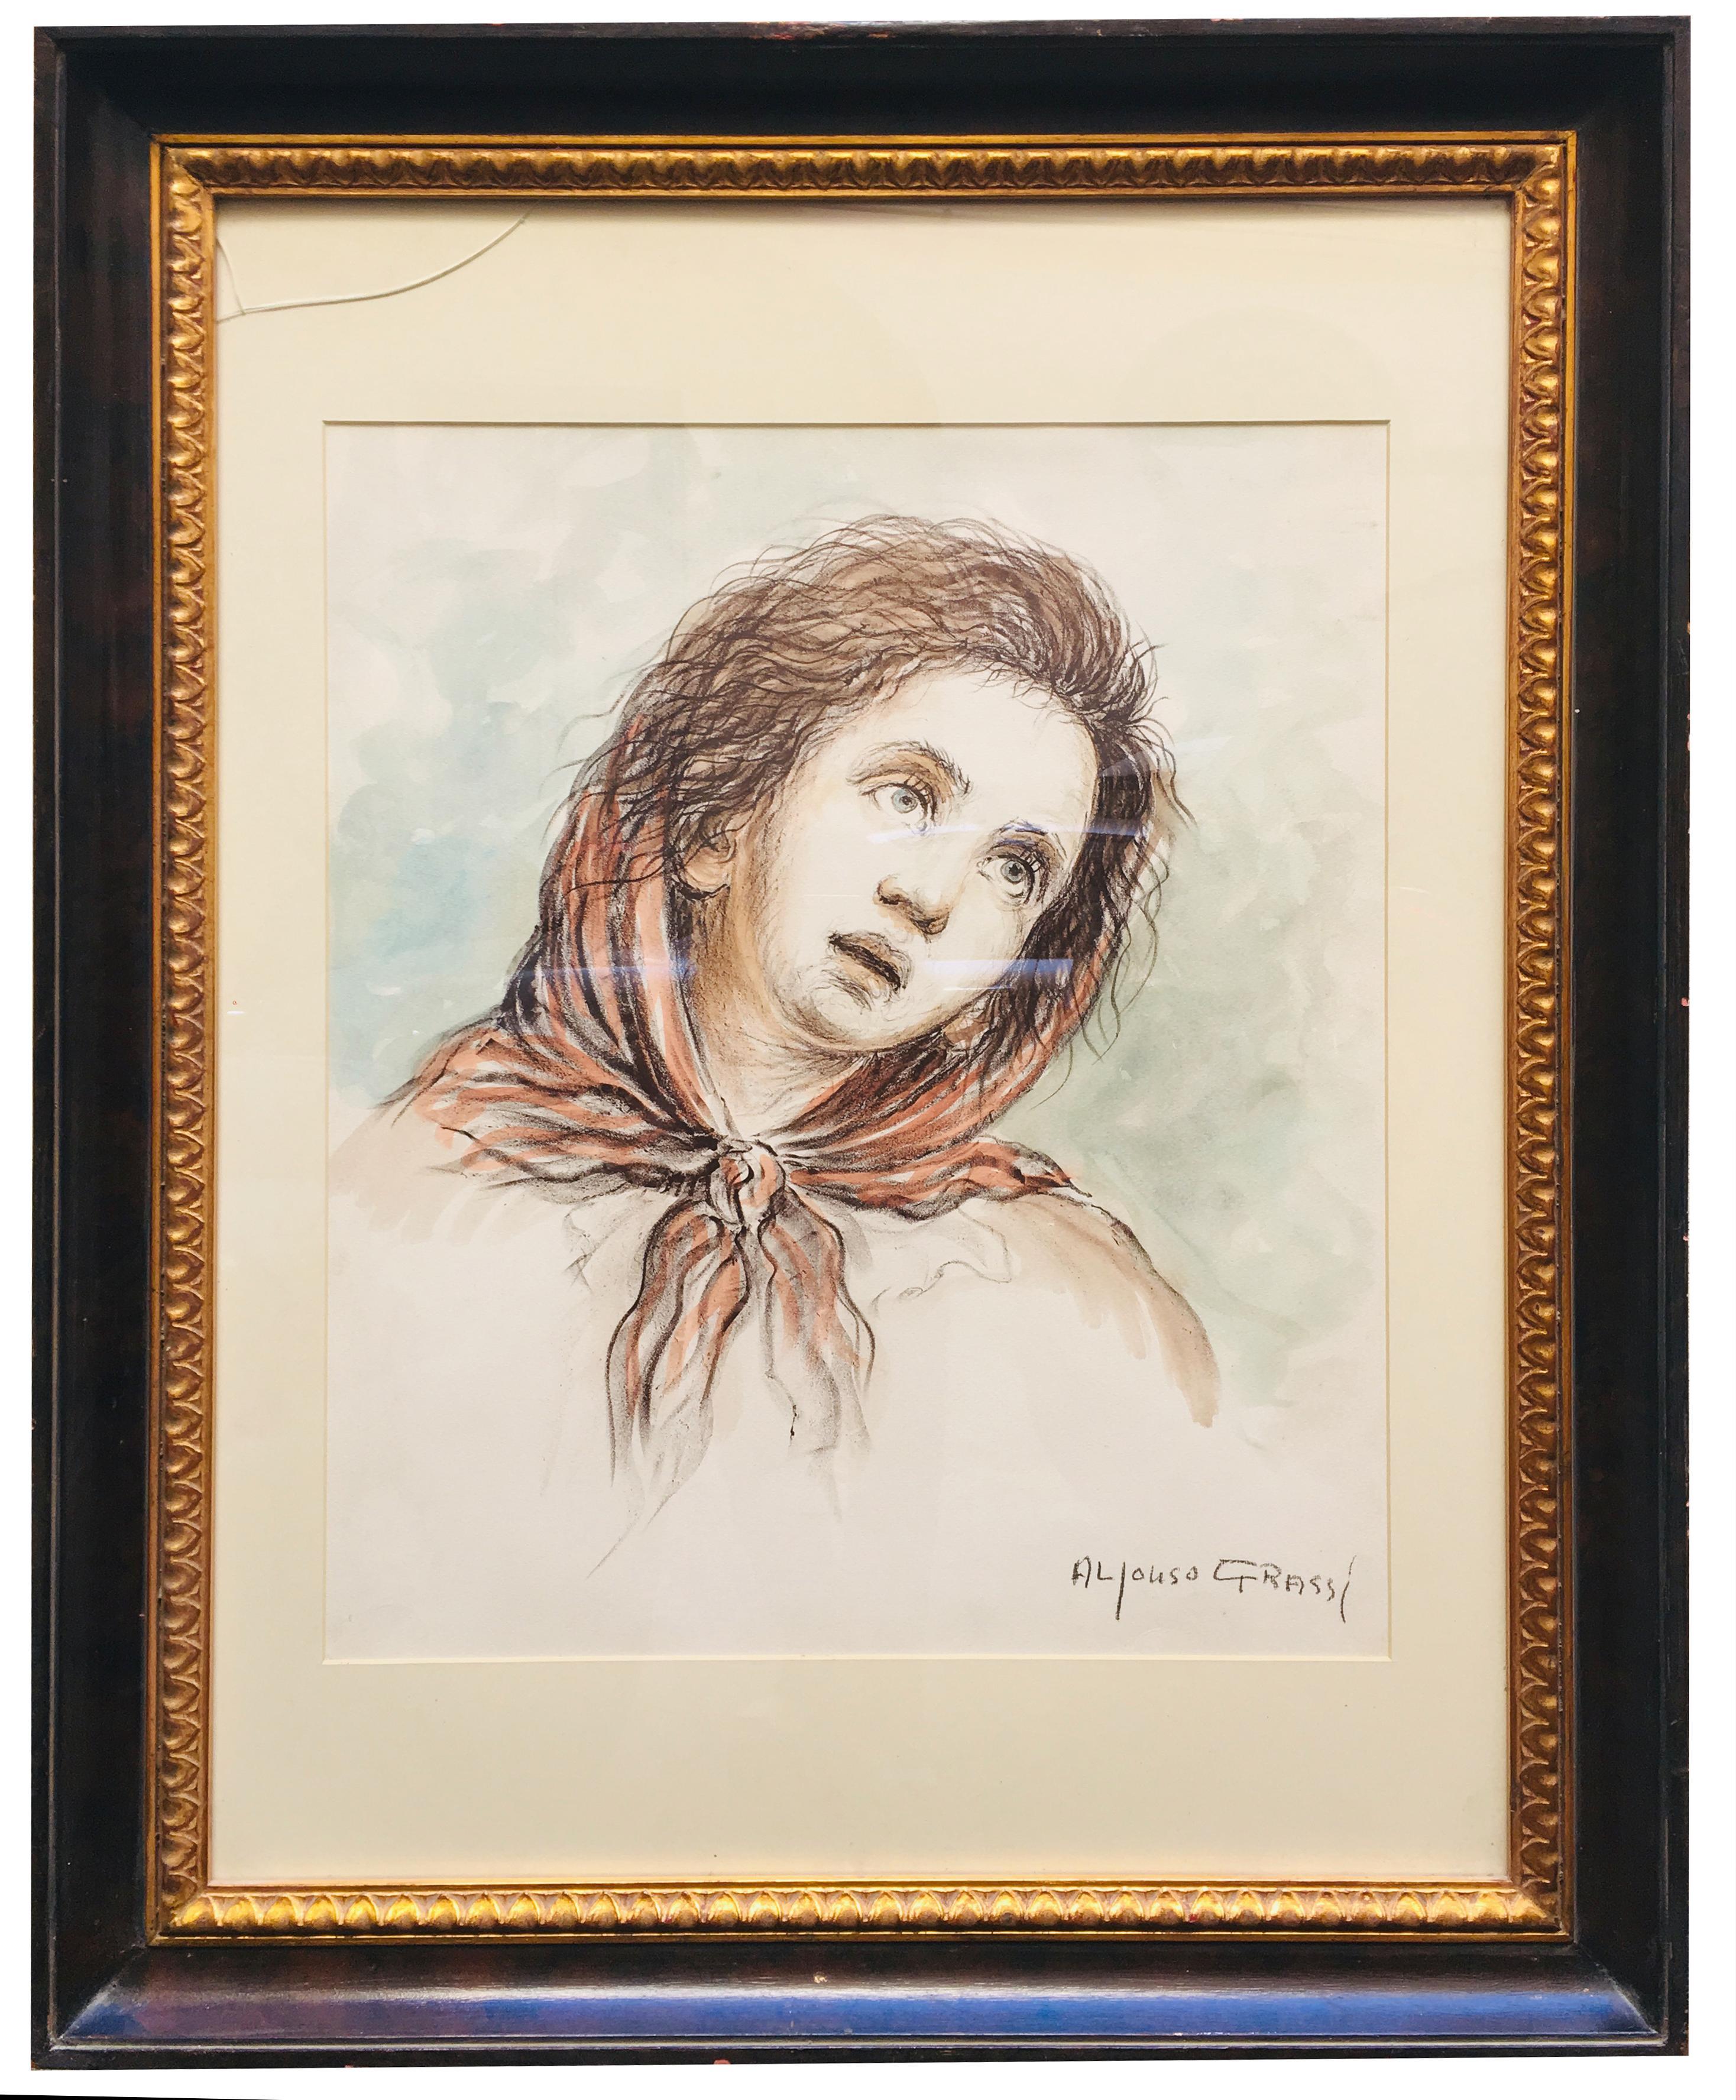 CHILD - Alfonso Grassi Pastel on paper  Portrait italian Painting